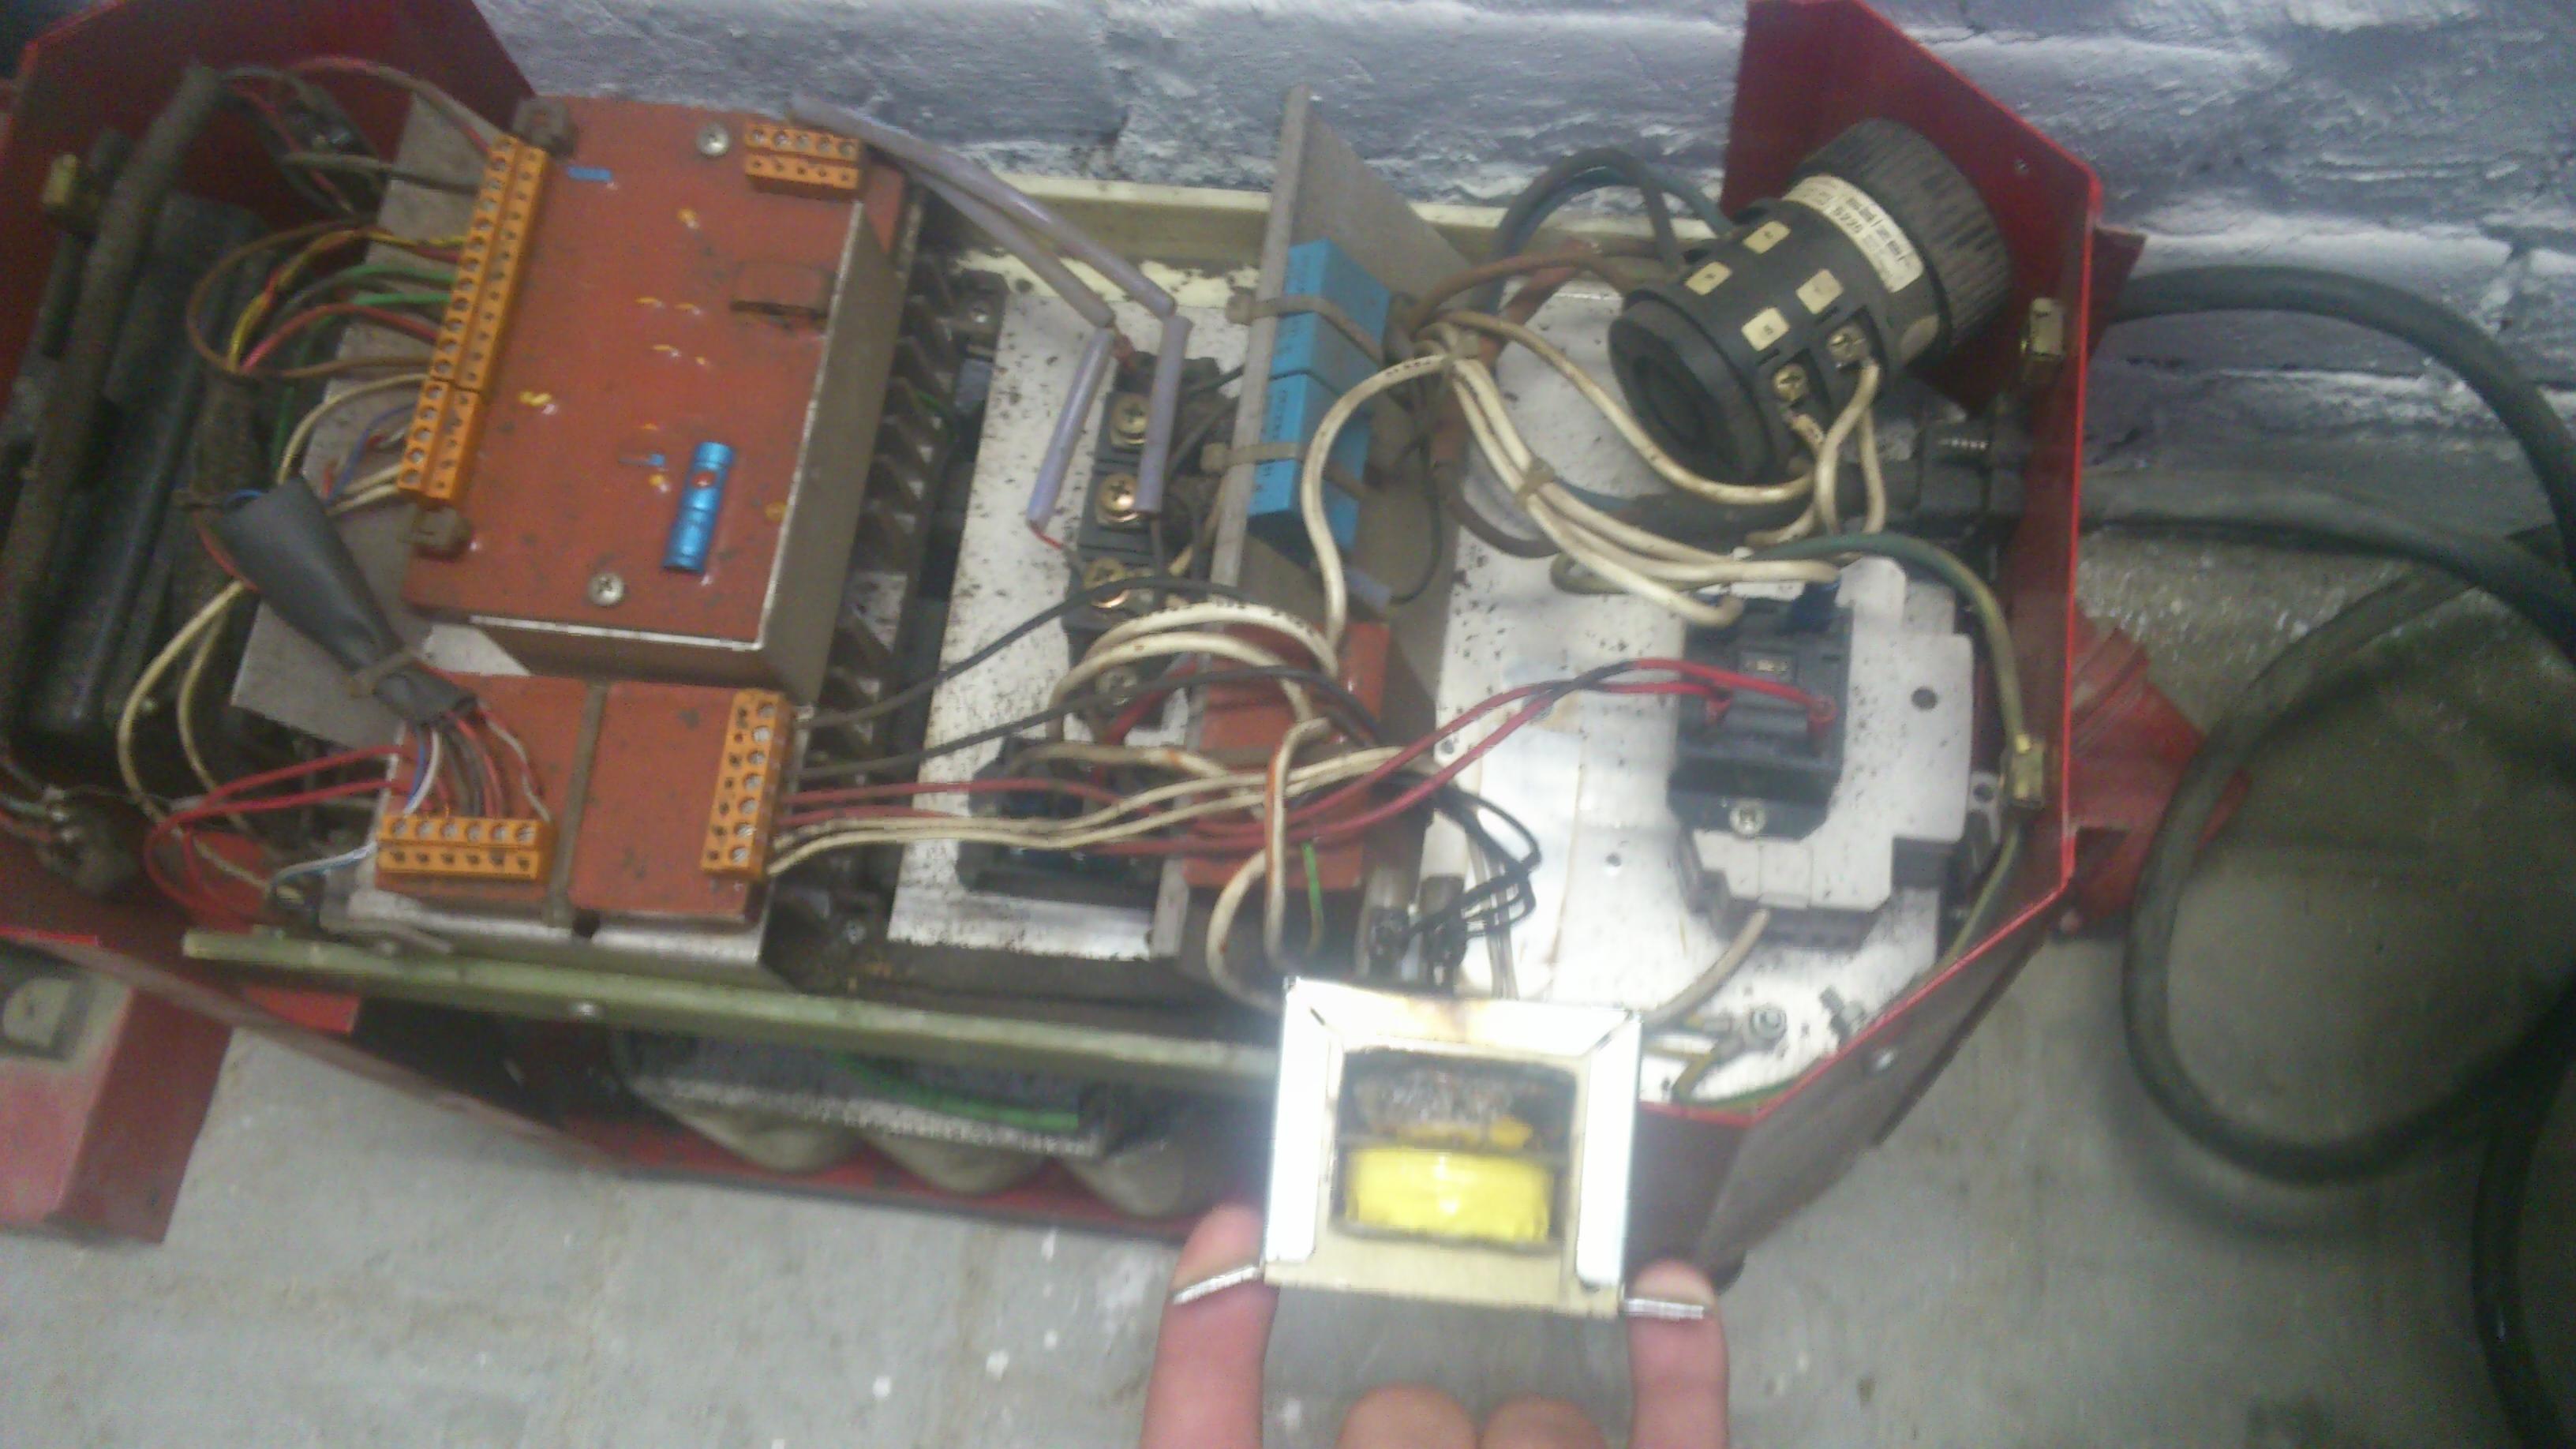 Skand Weld Sweden Type E 350 spalony transformator? Pomoc w ident. lub schemat